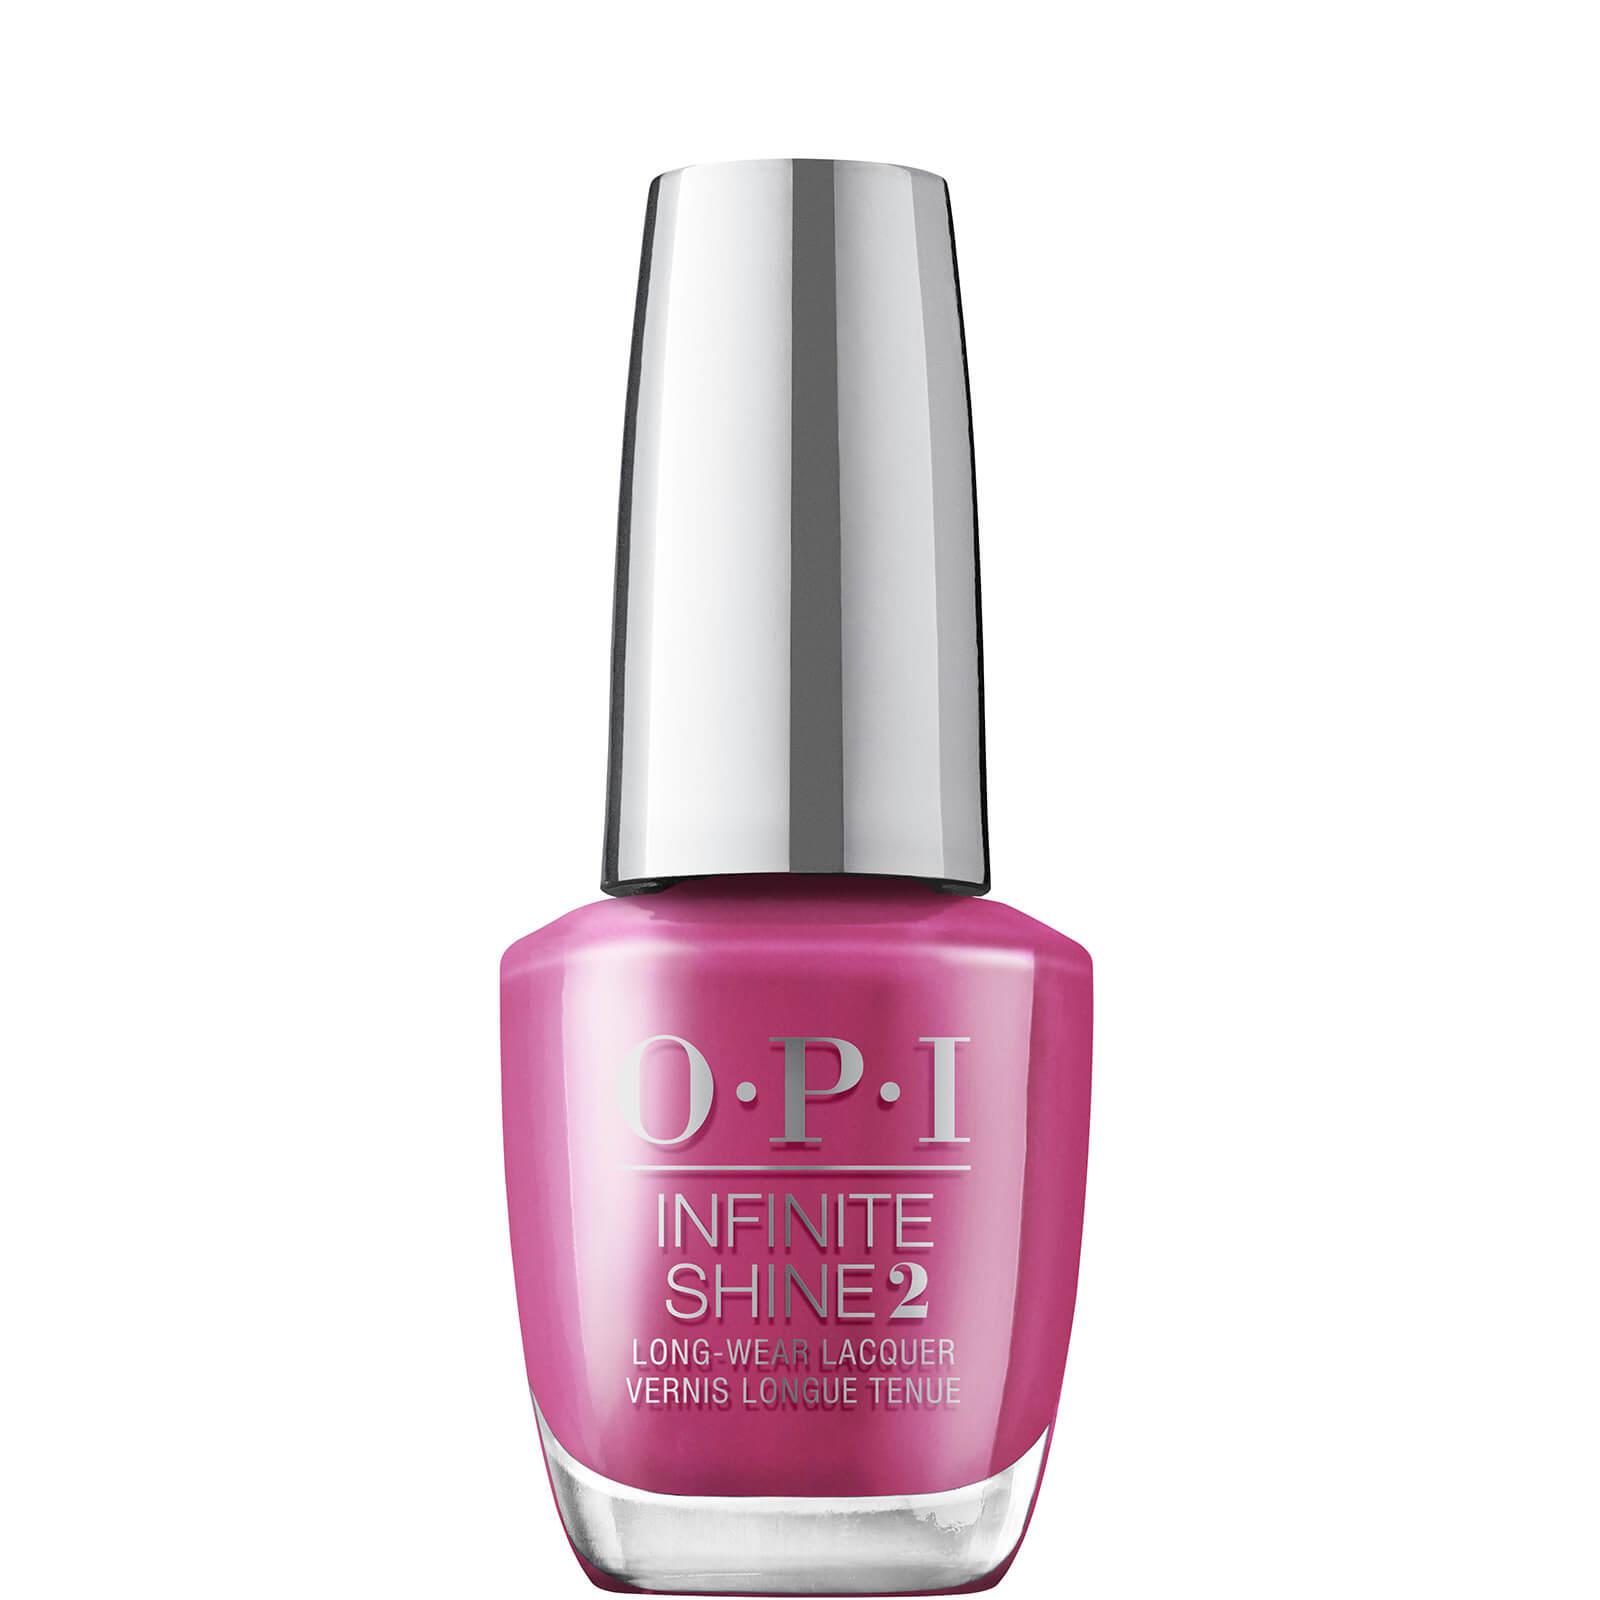 Купить OPI DTLA Collection Infinite Shine Long-wear Nail Polish 15ml (Various Shades) - 7th and Flower